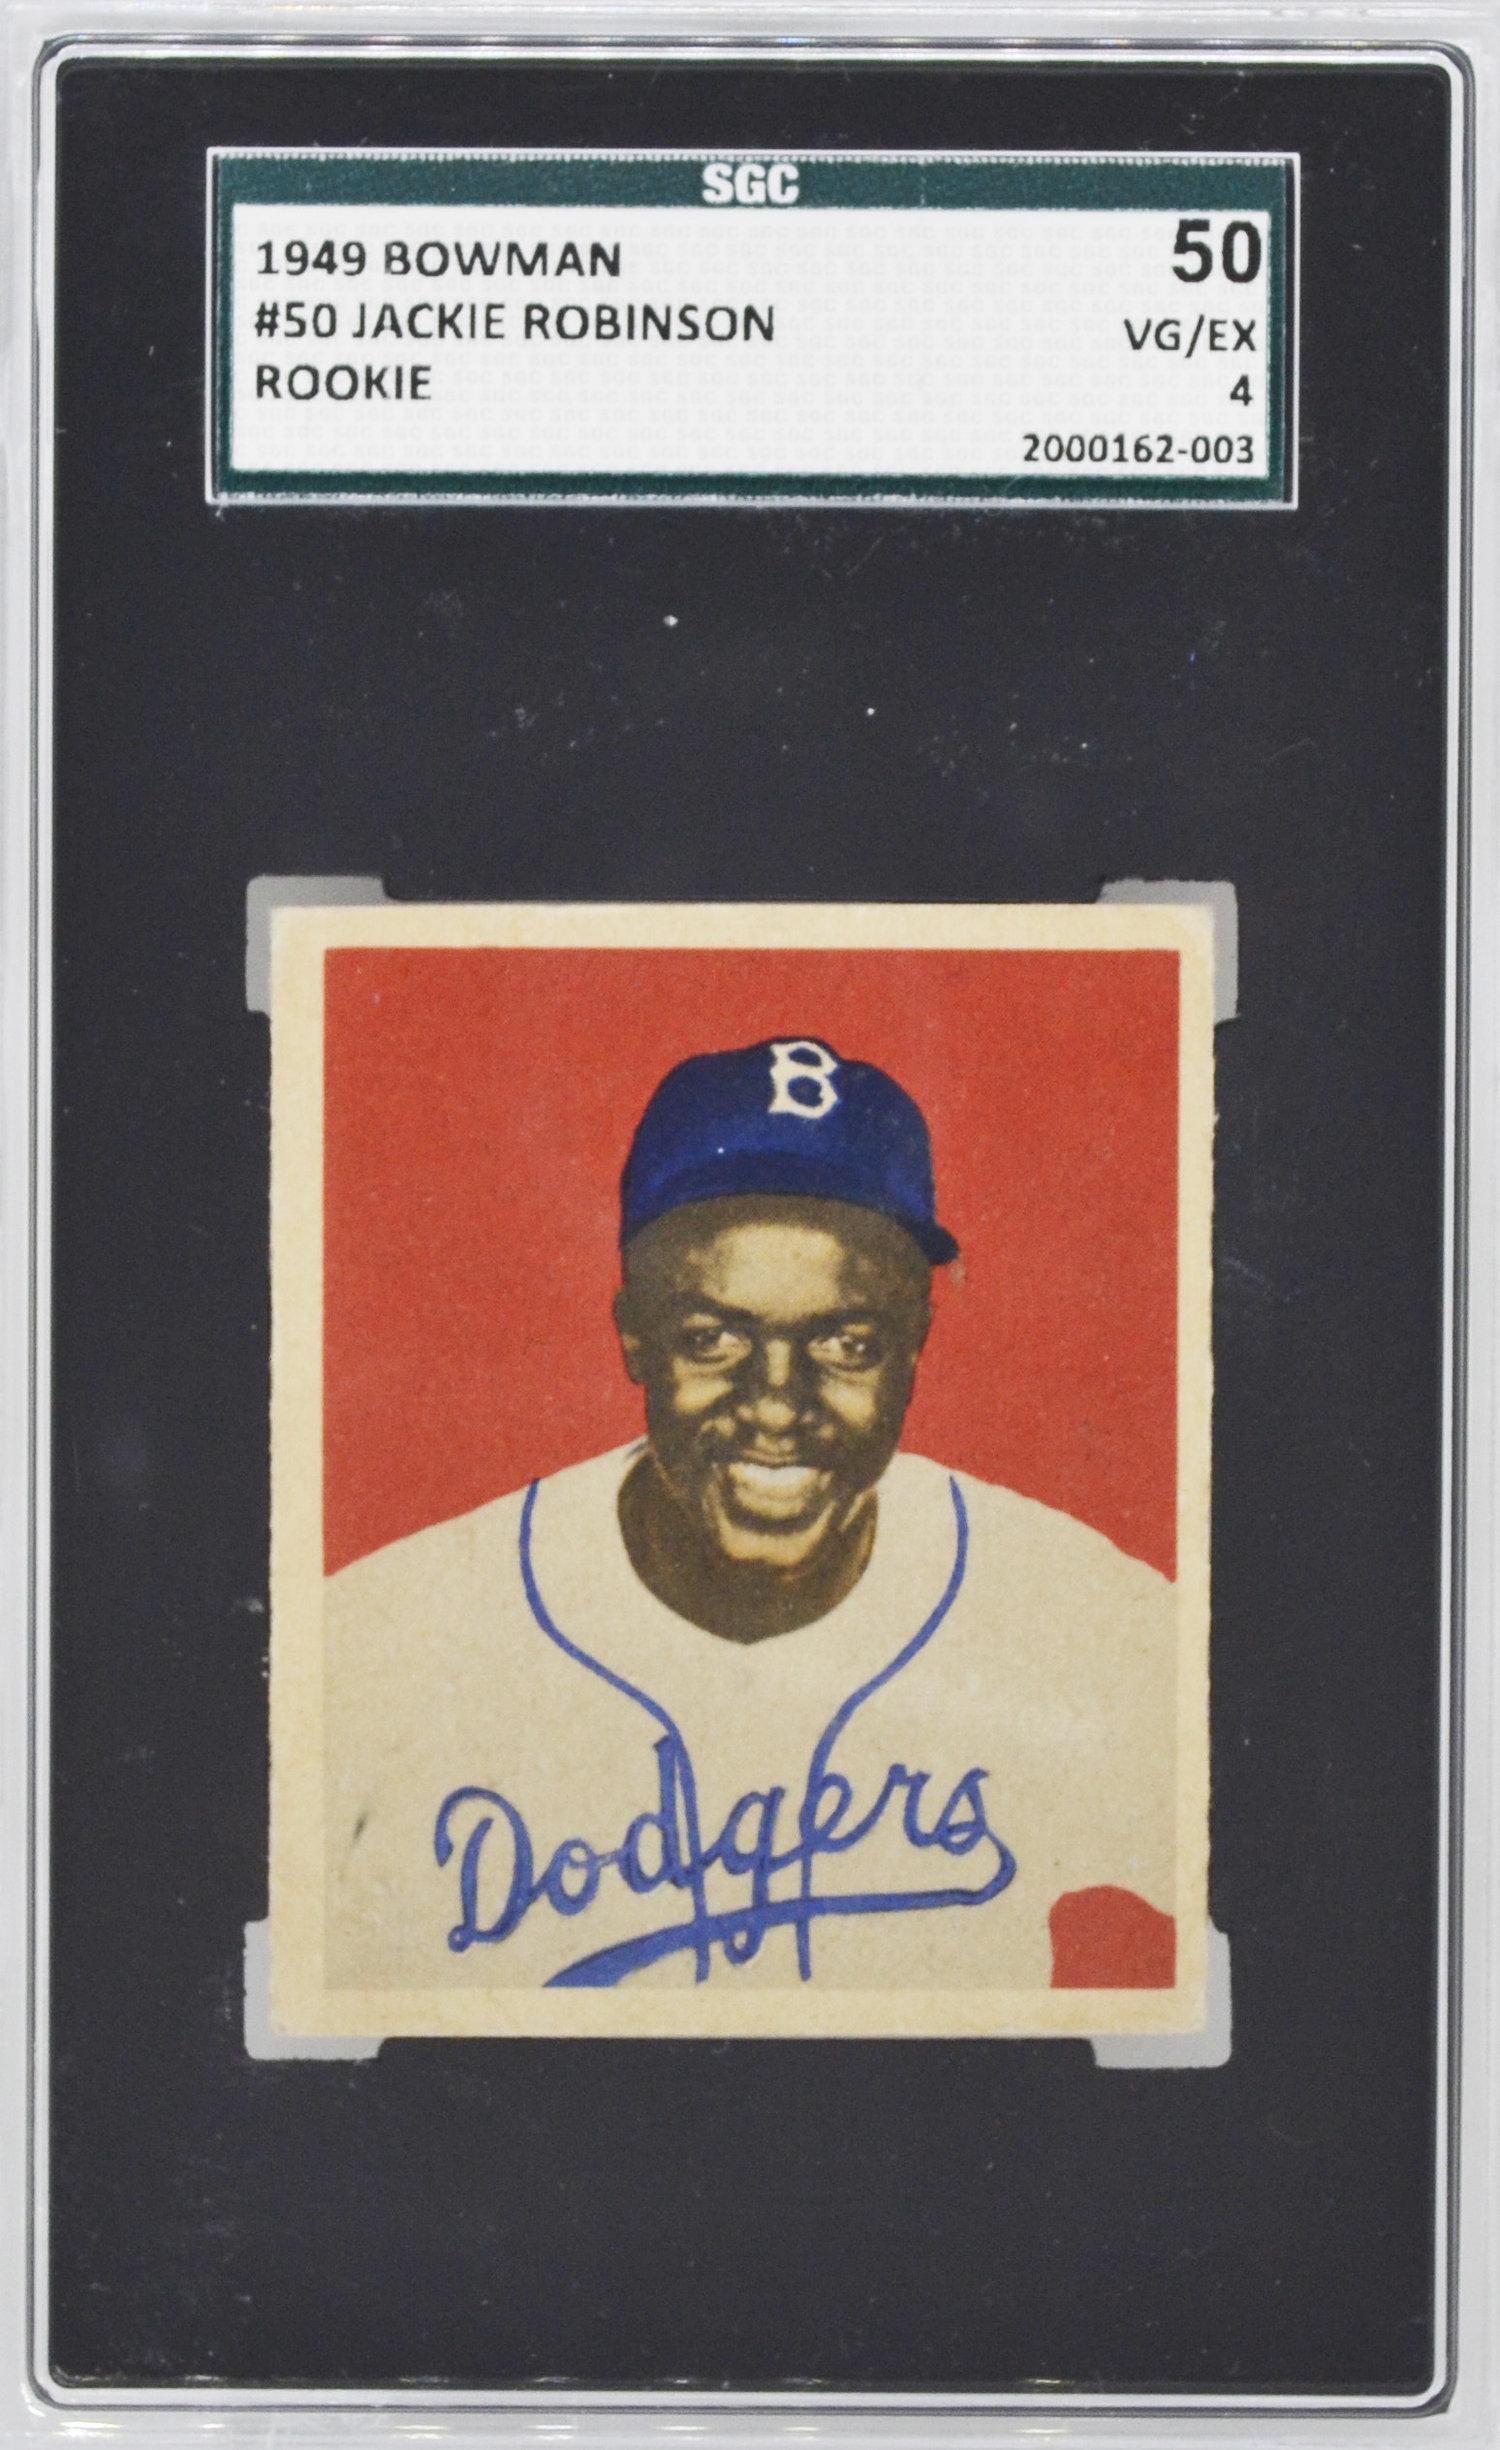 Jackie Robinson 1948 Leaf Vs 1949 Bowman Top Sports Cards